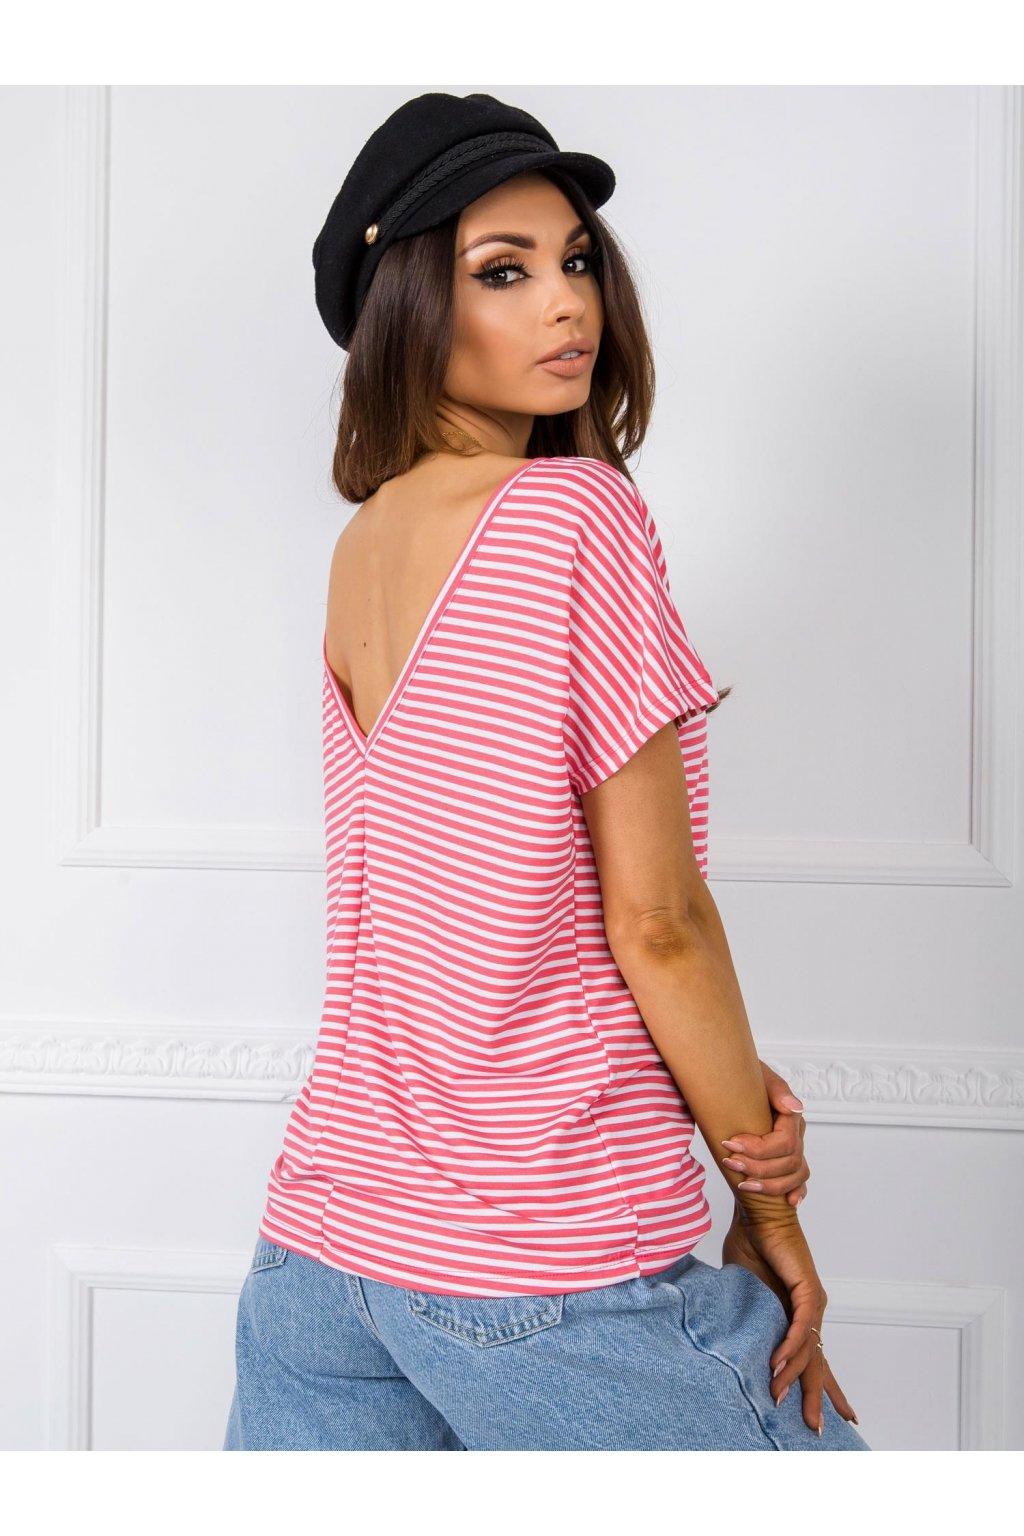 pol pl Bialo koralowy t shirt Gina RUE PARIS 348052 1